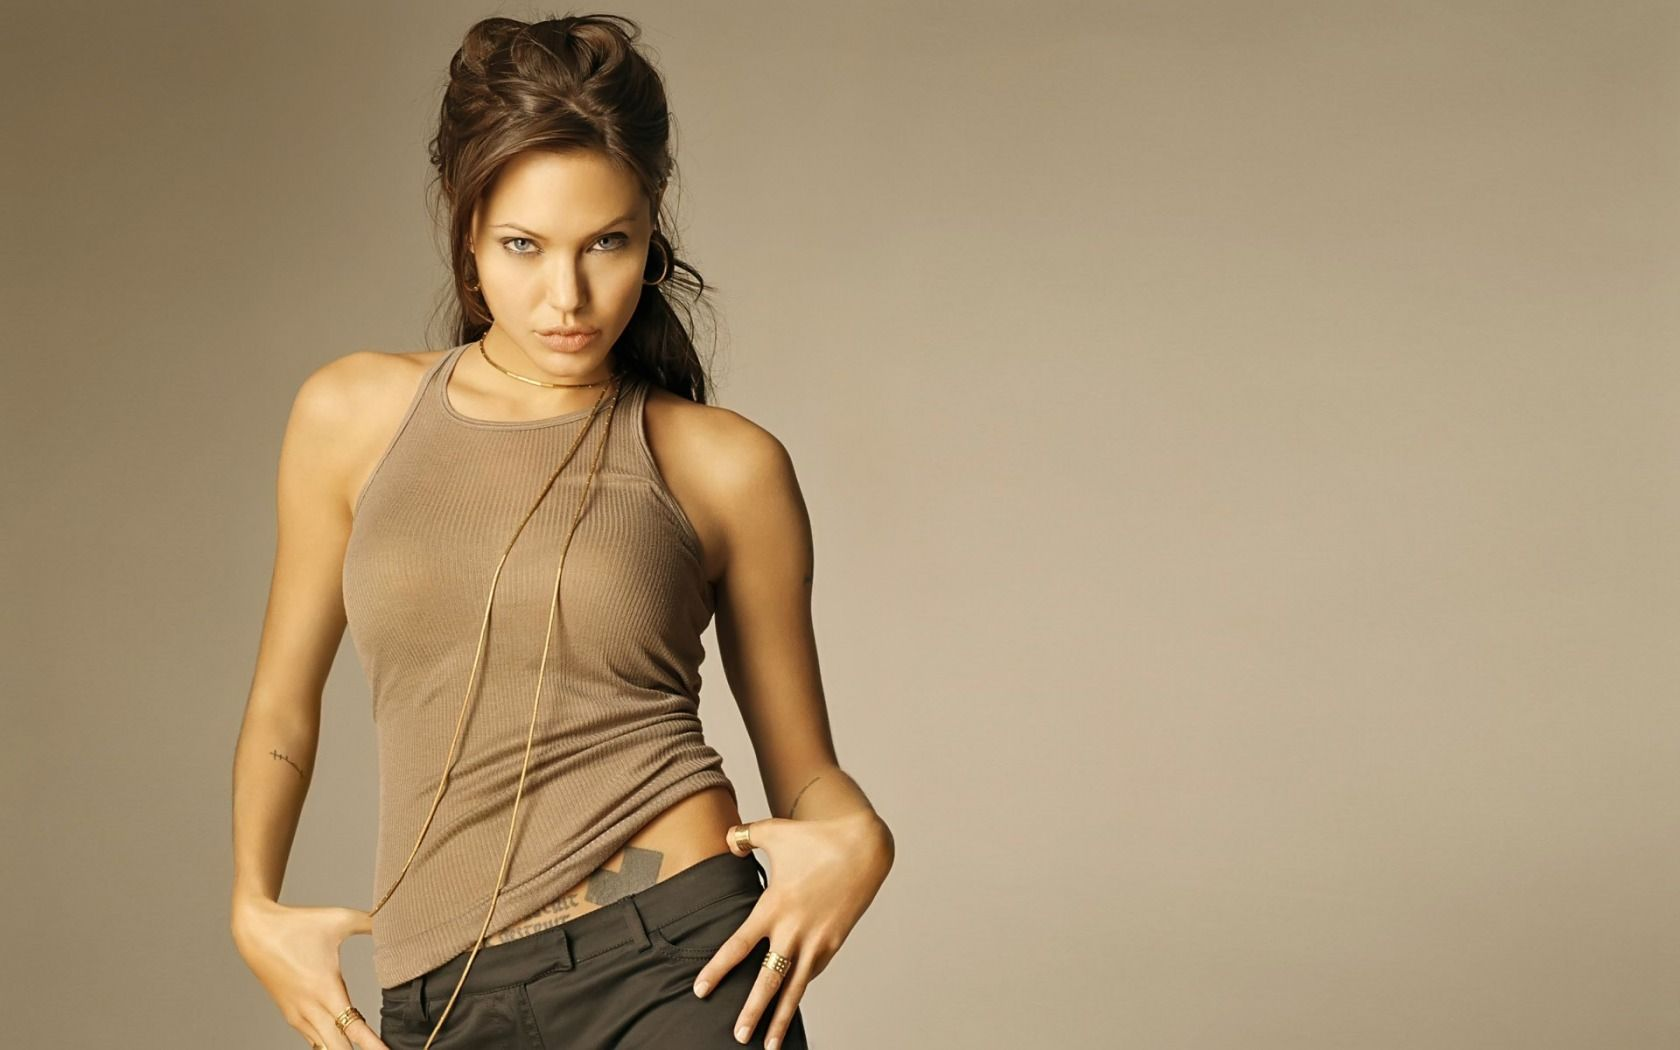 Angelina Jolie actress angelina jolie brunette girl gray 1680x1050